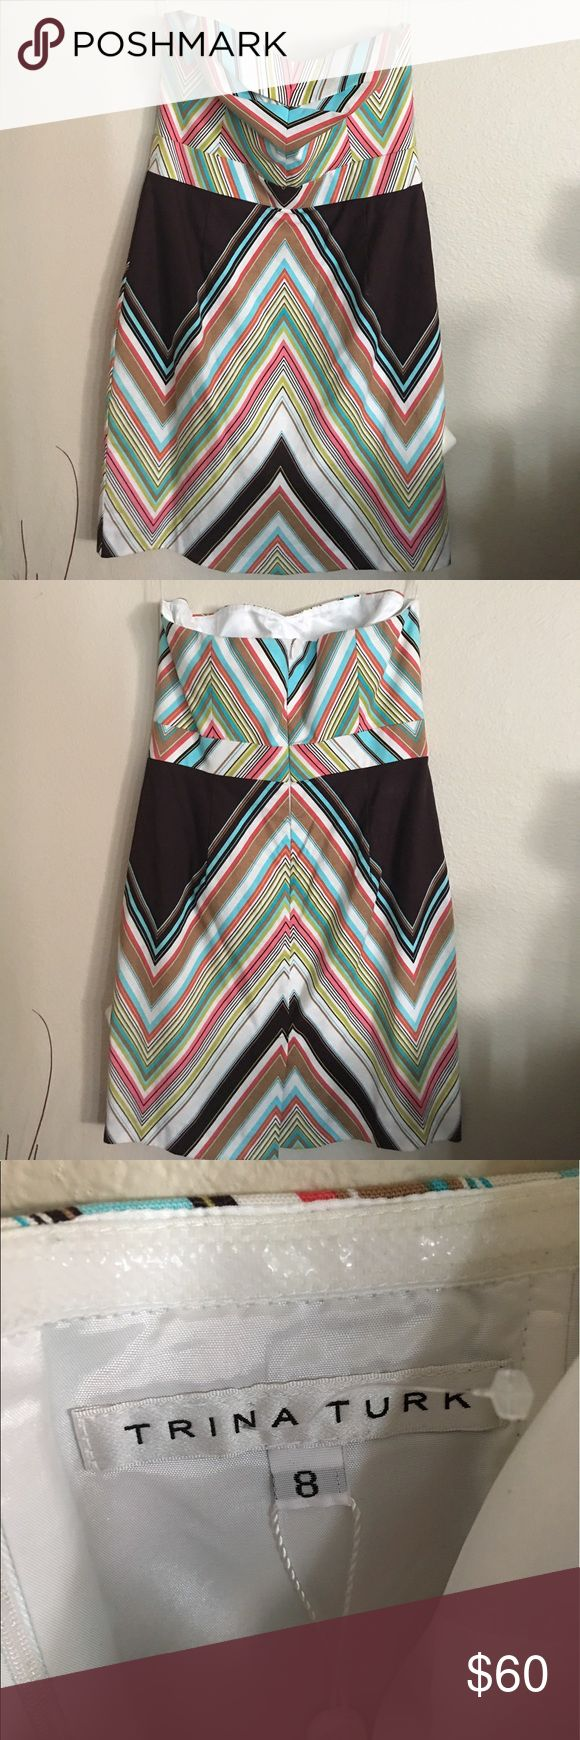 🎉1Day Sale🎉Trina Turk Animal Print Strapless Dre NWT Trina Turk Cora Strapless Striped Dress. Multi-color Summer Dress. Trina Turk Dresses Strapless